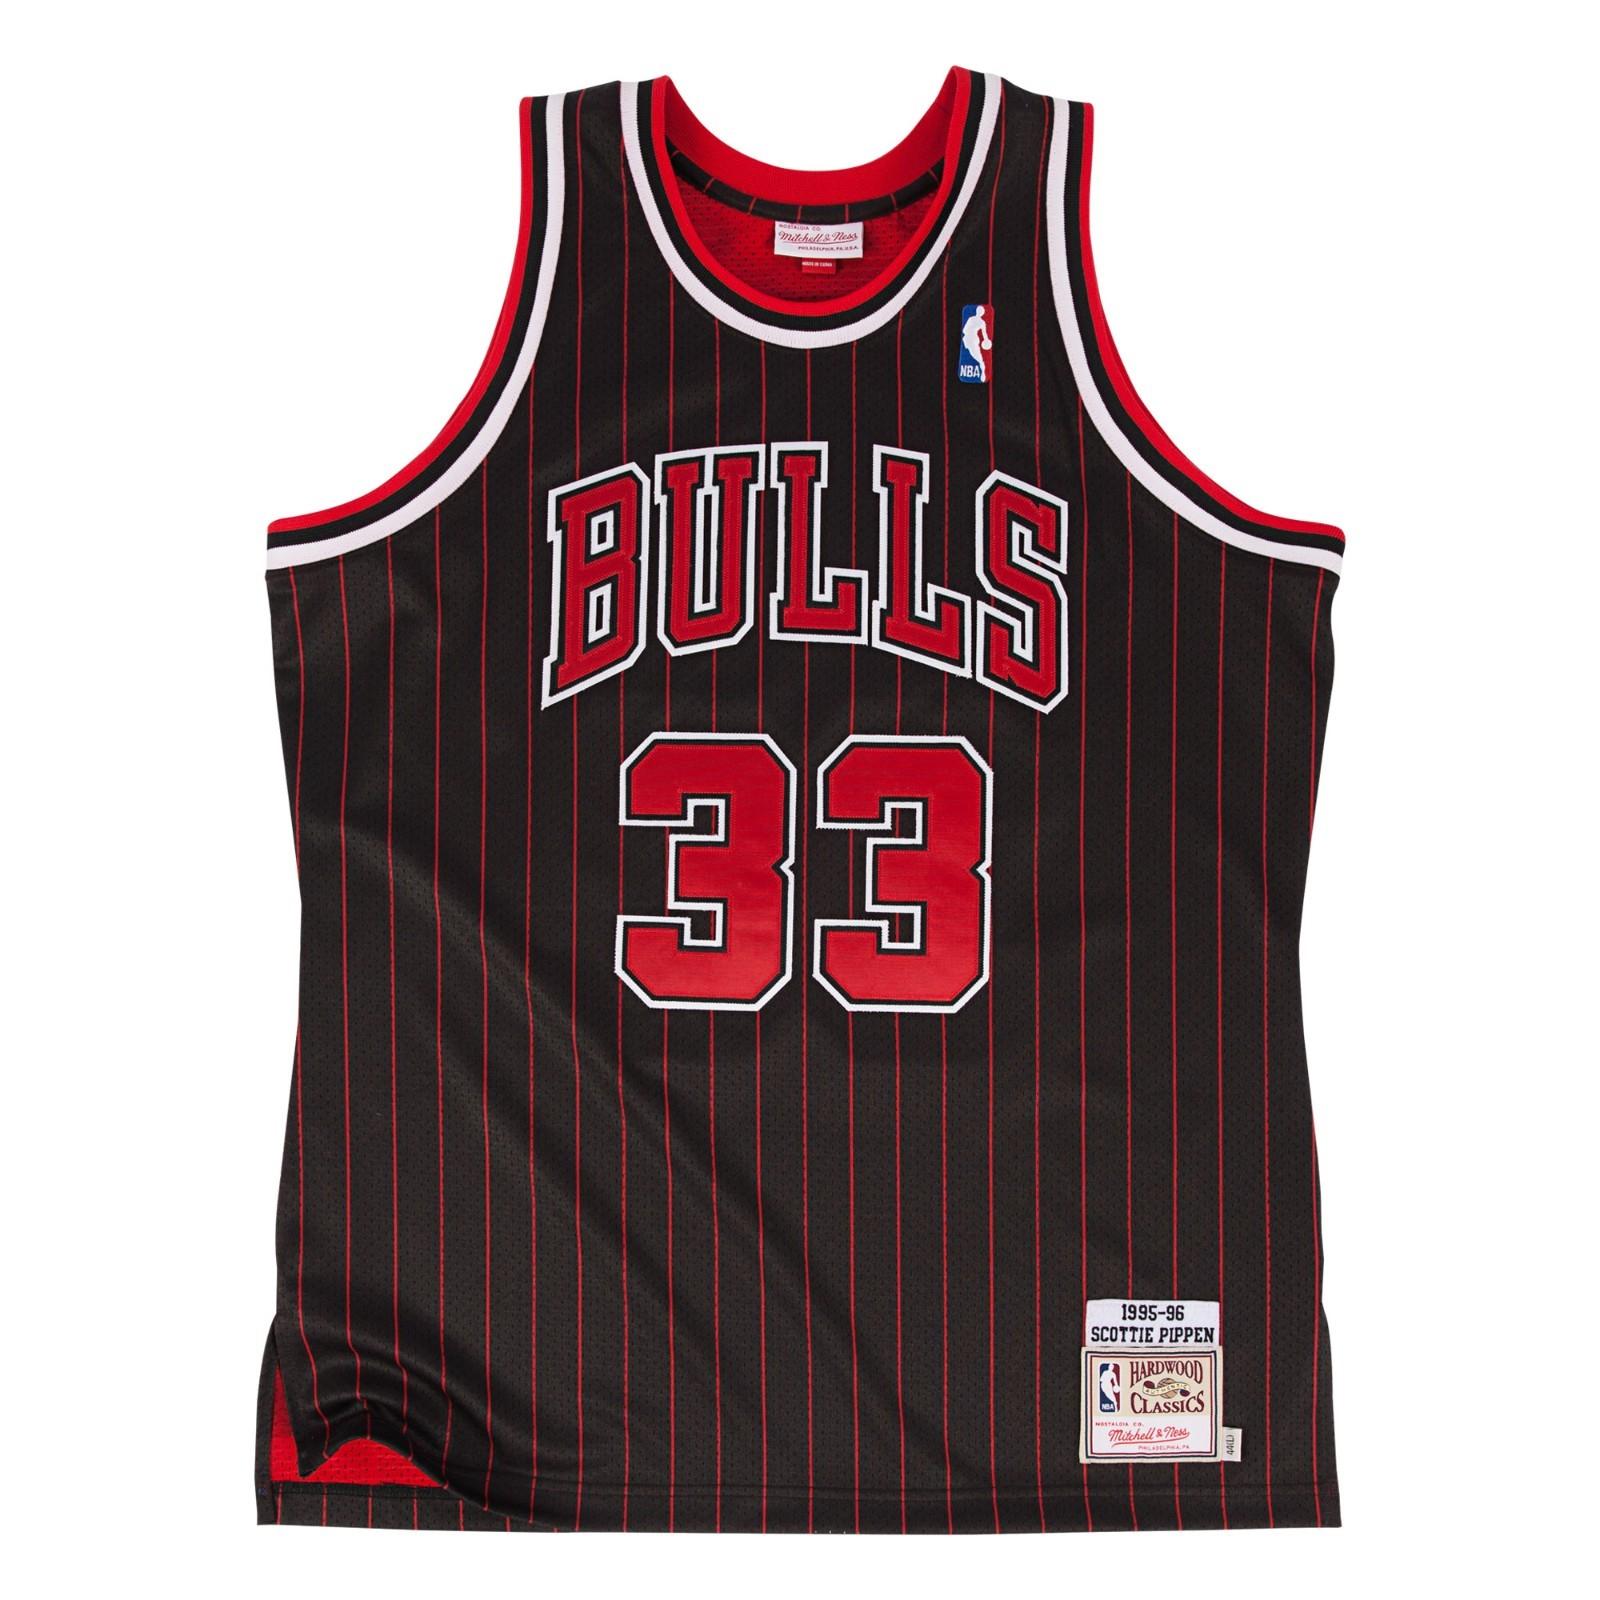 Scottie Pippen 1995-96 Chicago Bulls Mitchell & Ness Authentic Alternate Jersey